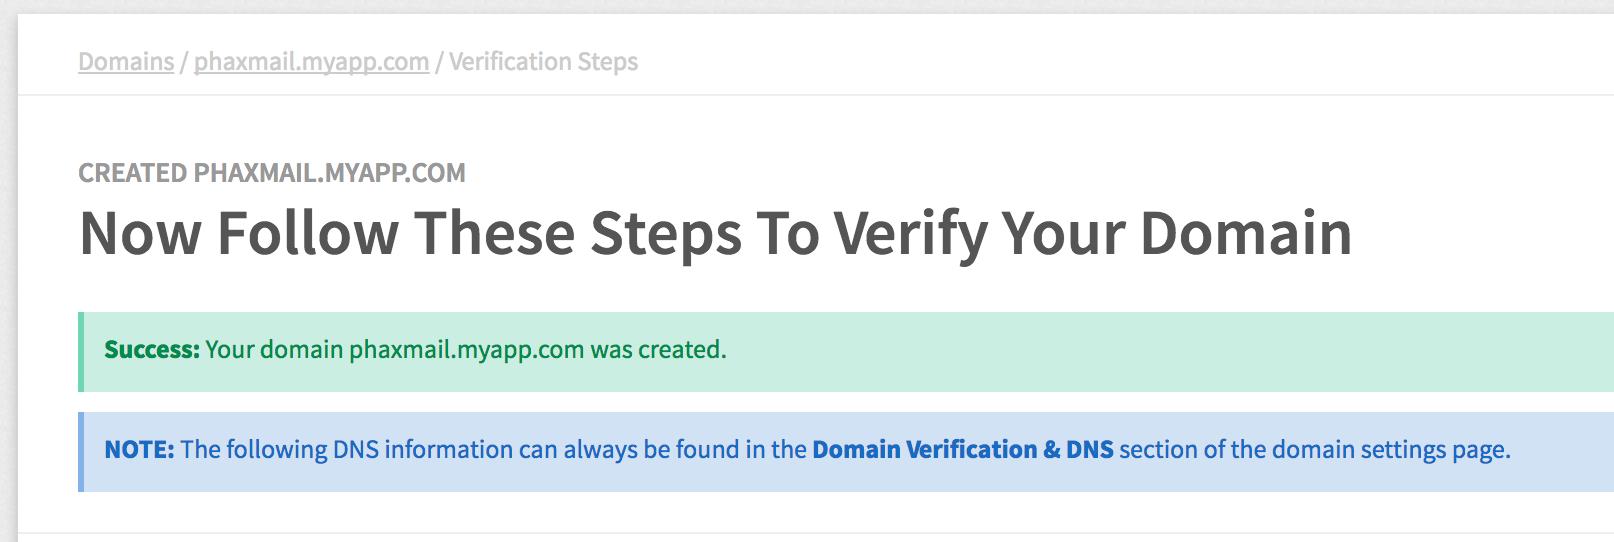 Mailgun Verify Domain Page Screenshot